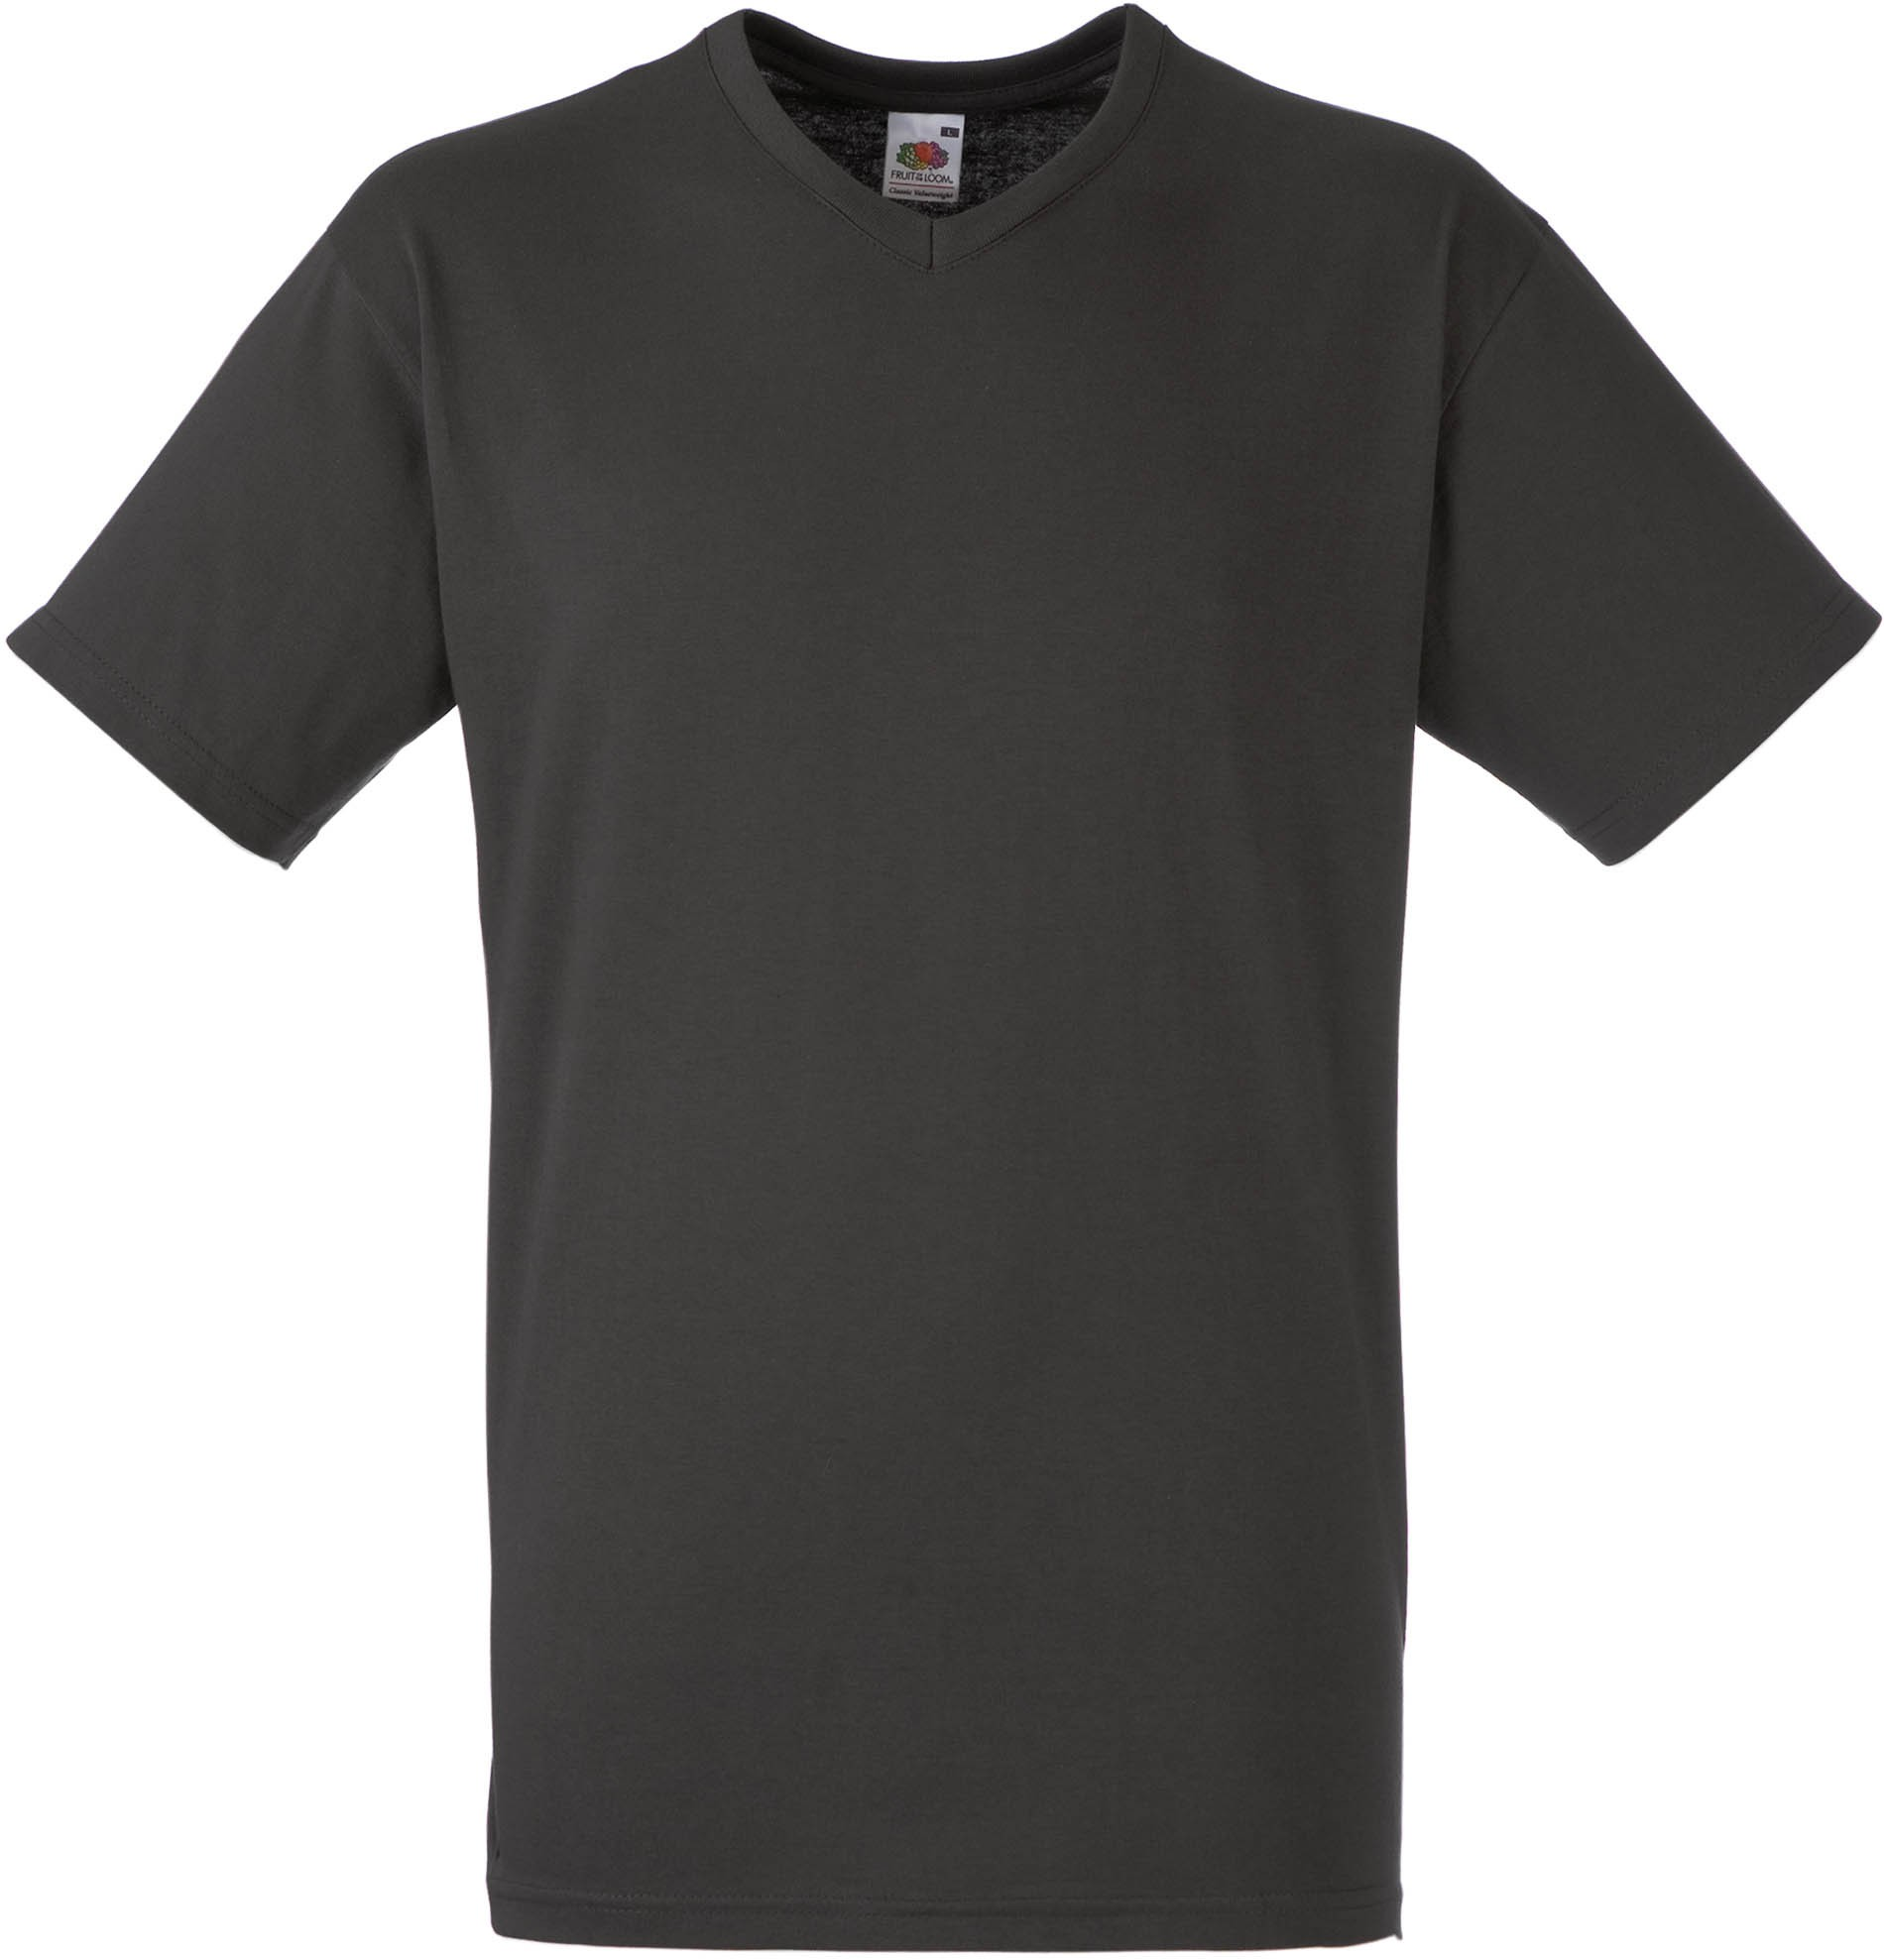 buy online 67965 90b9a tee-shirt-homme-col-v-fruit-of-the-loom-sc22vc.jpg